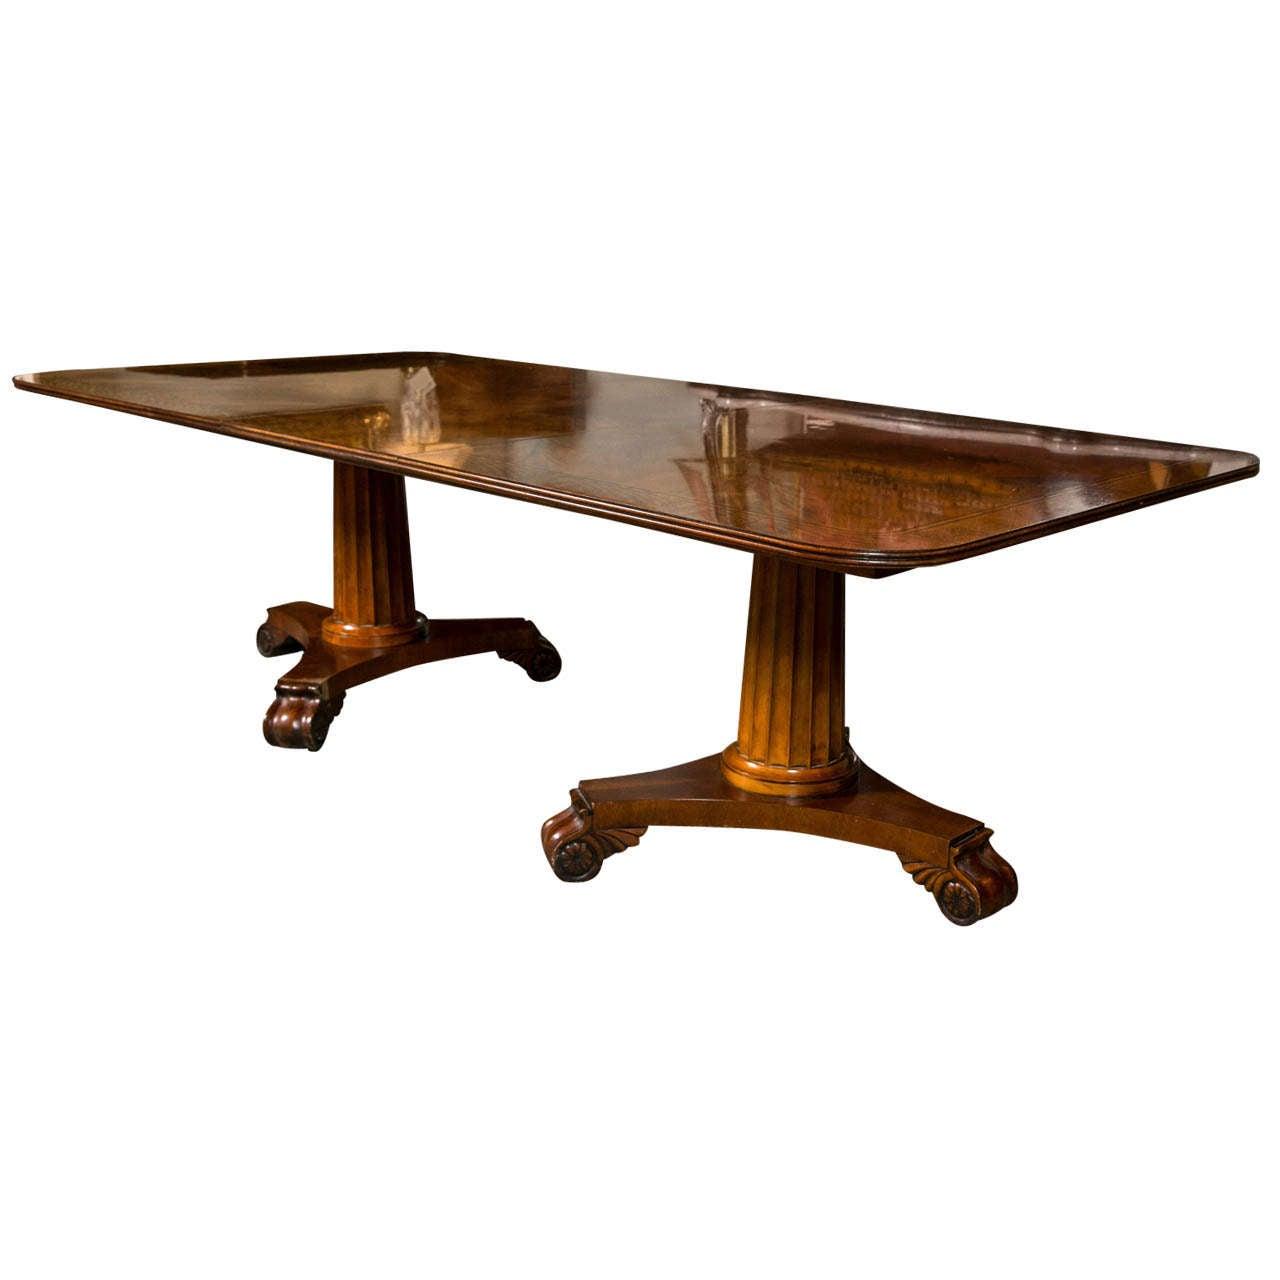 Henredon banded crotch mahogany dining table at 1stdibs for Mahogany dining table